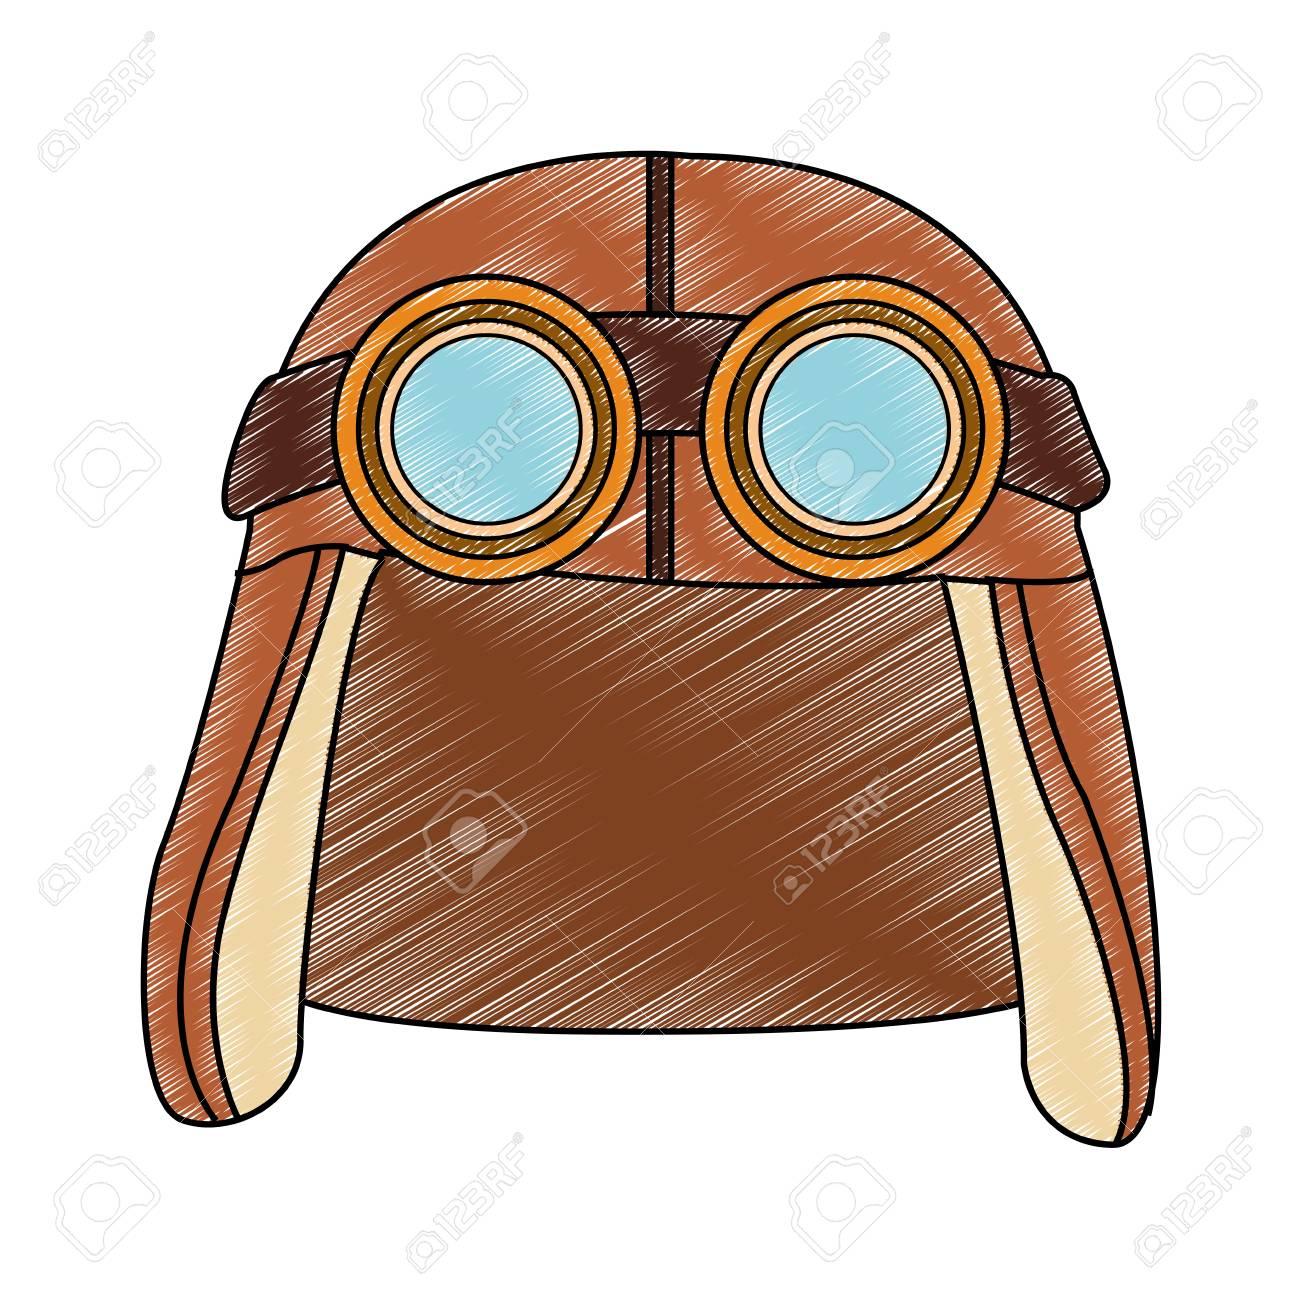 8860baeedd Vintage aviation hat with glasses vector illustration graphic design Stock  Vector - 102905271